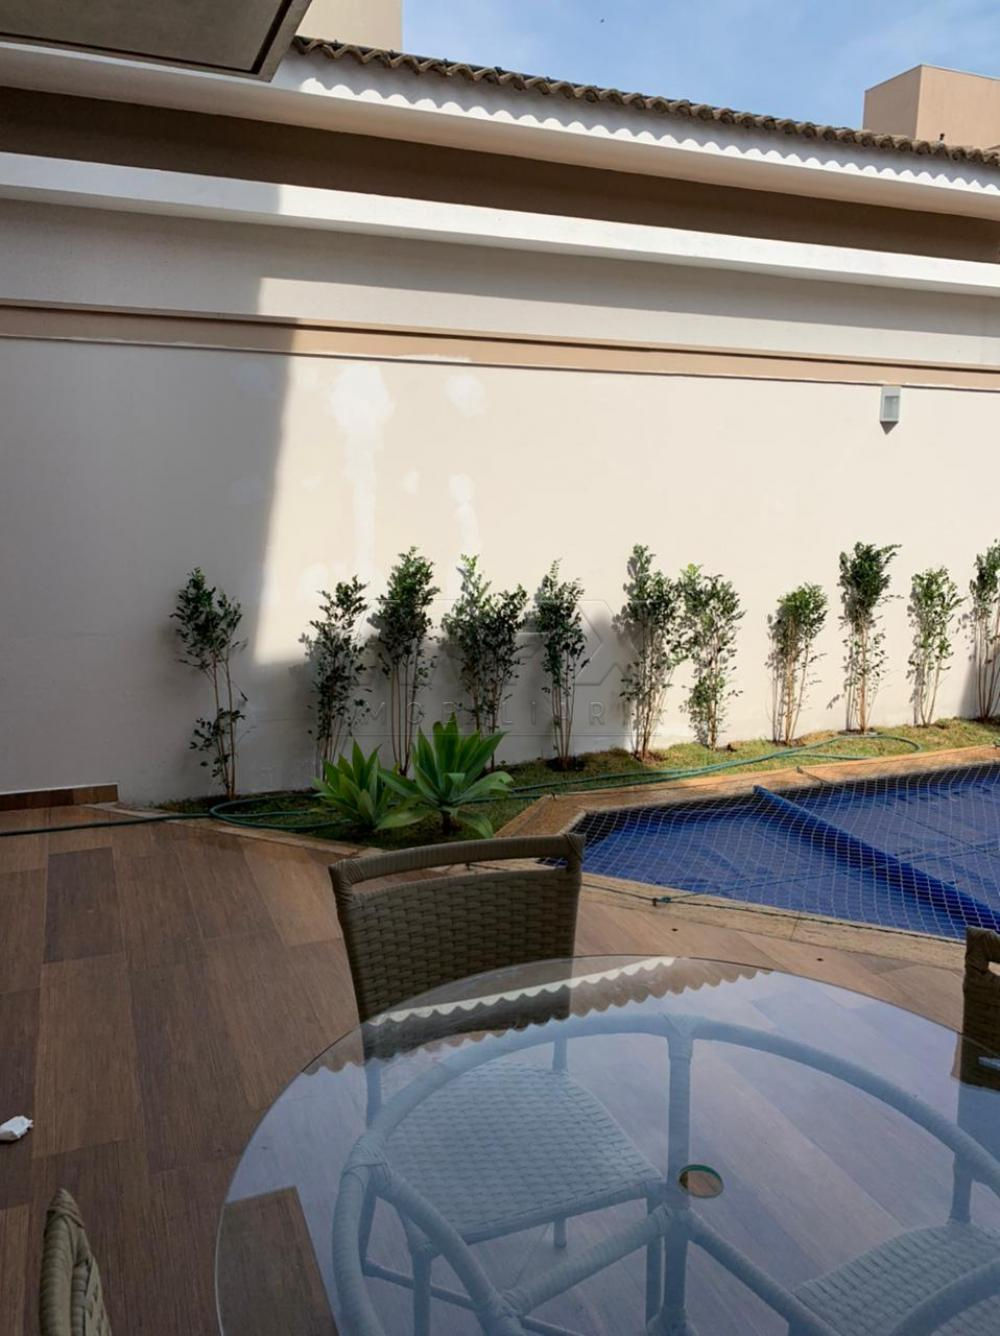 Alugar Casa / Condomínio em Bauru R$ 7.000,00 - Foto 23